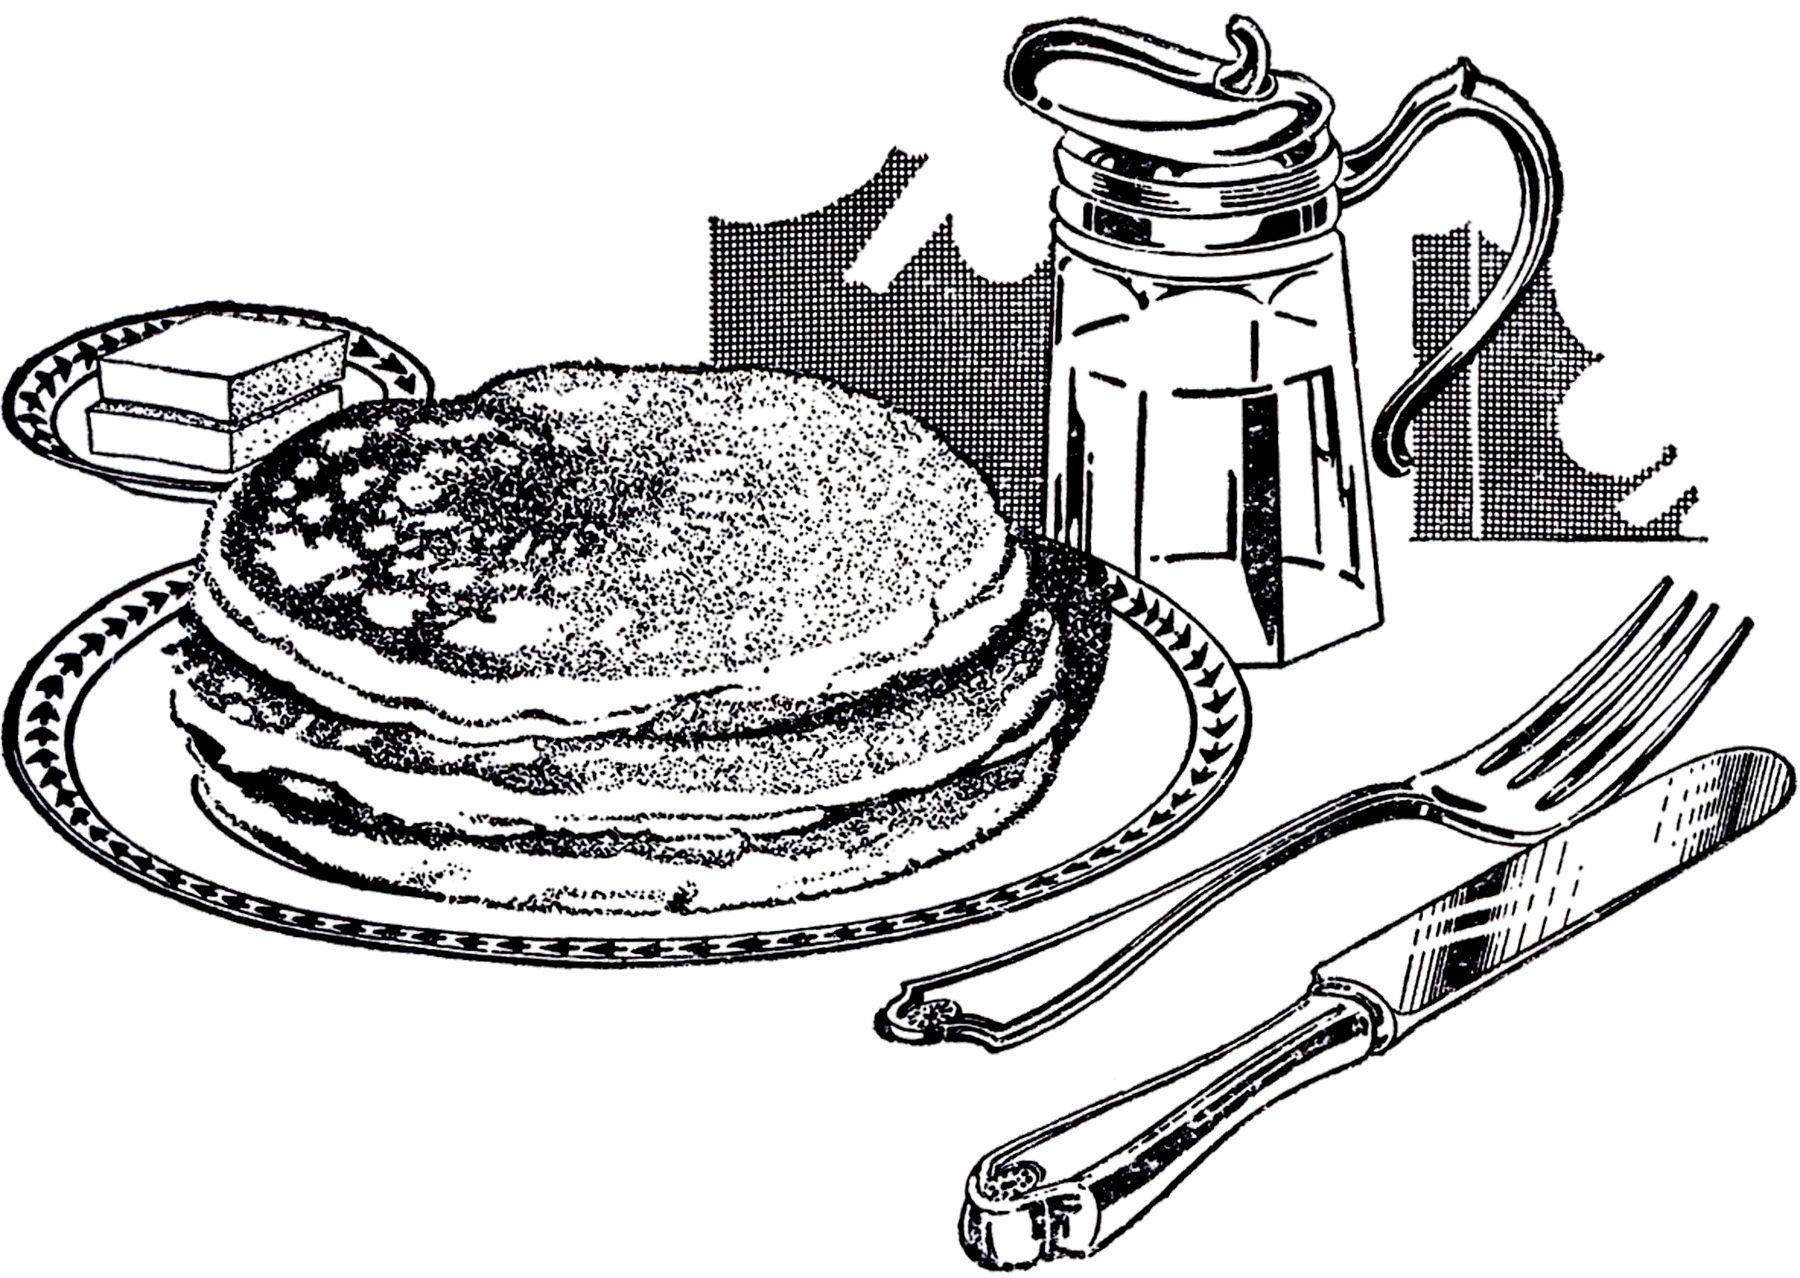 Vip breakfast clipart jpg transparent Pin by Lesley McPhillips on Printable letters | Breakfast ... jpg transparent